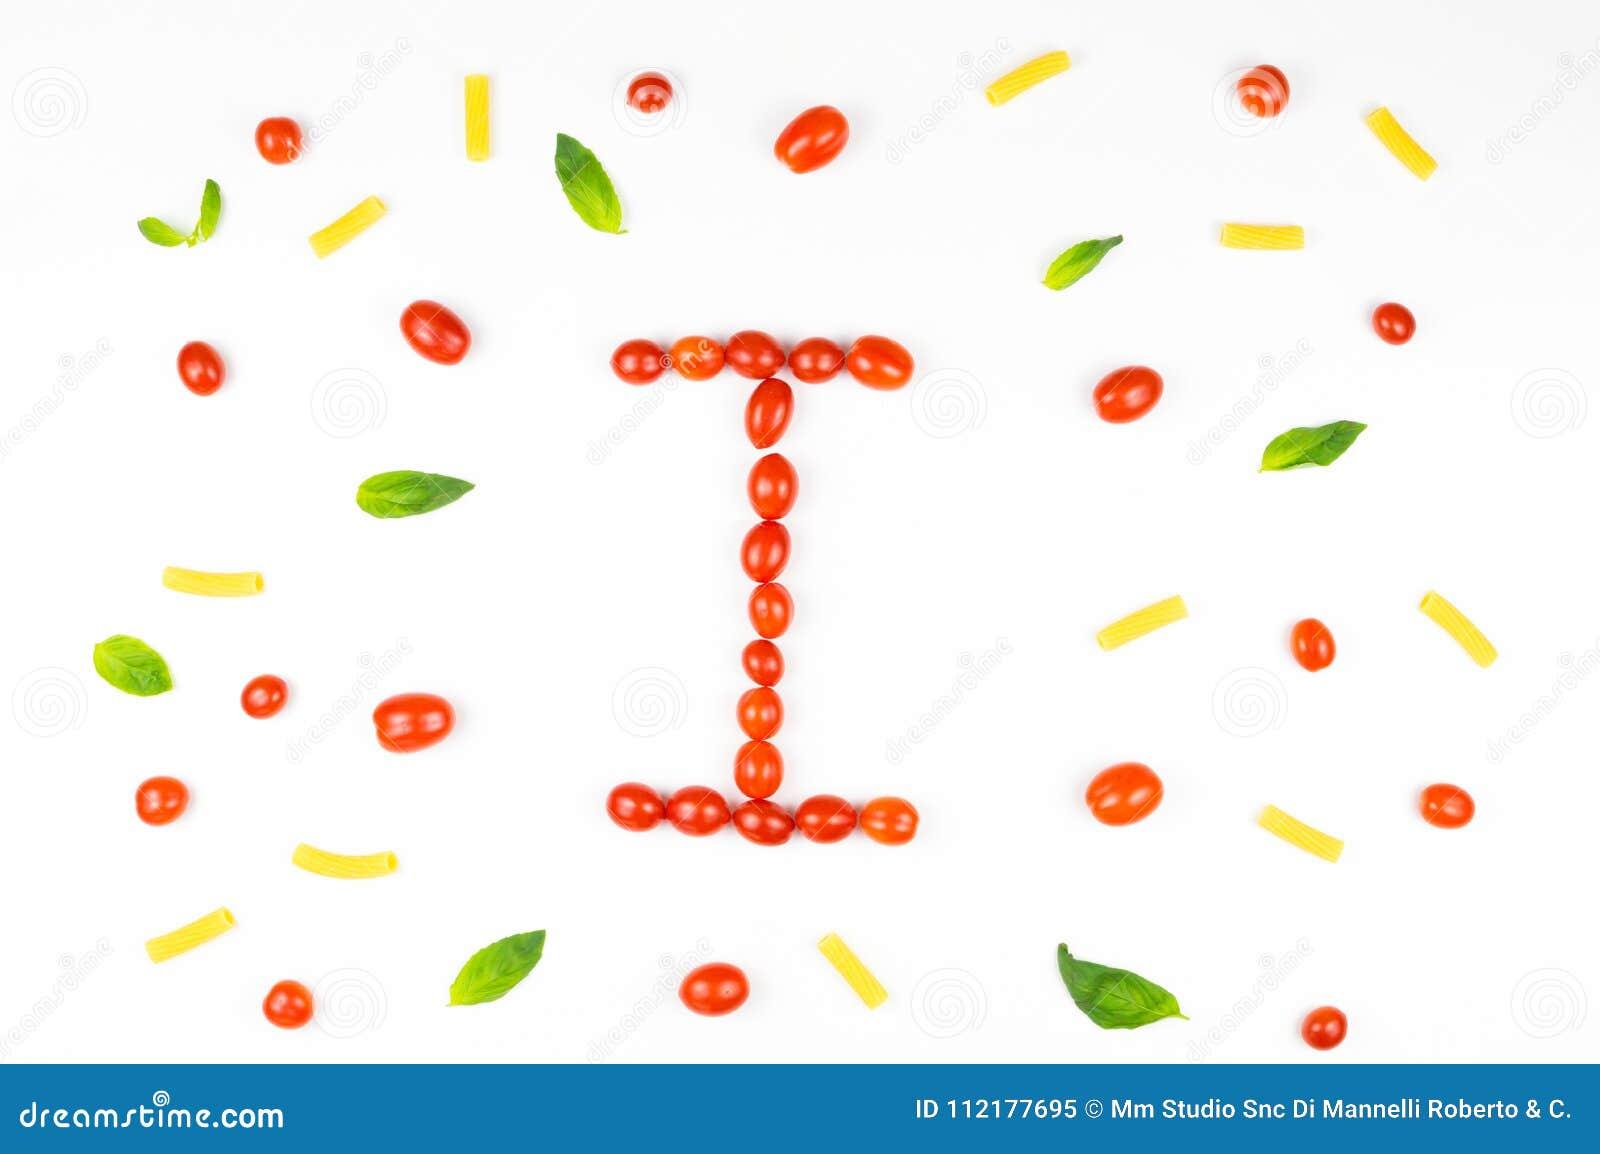 Italiaans voedsel die patroon met brief eten